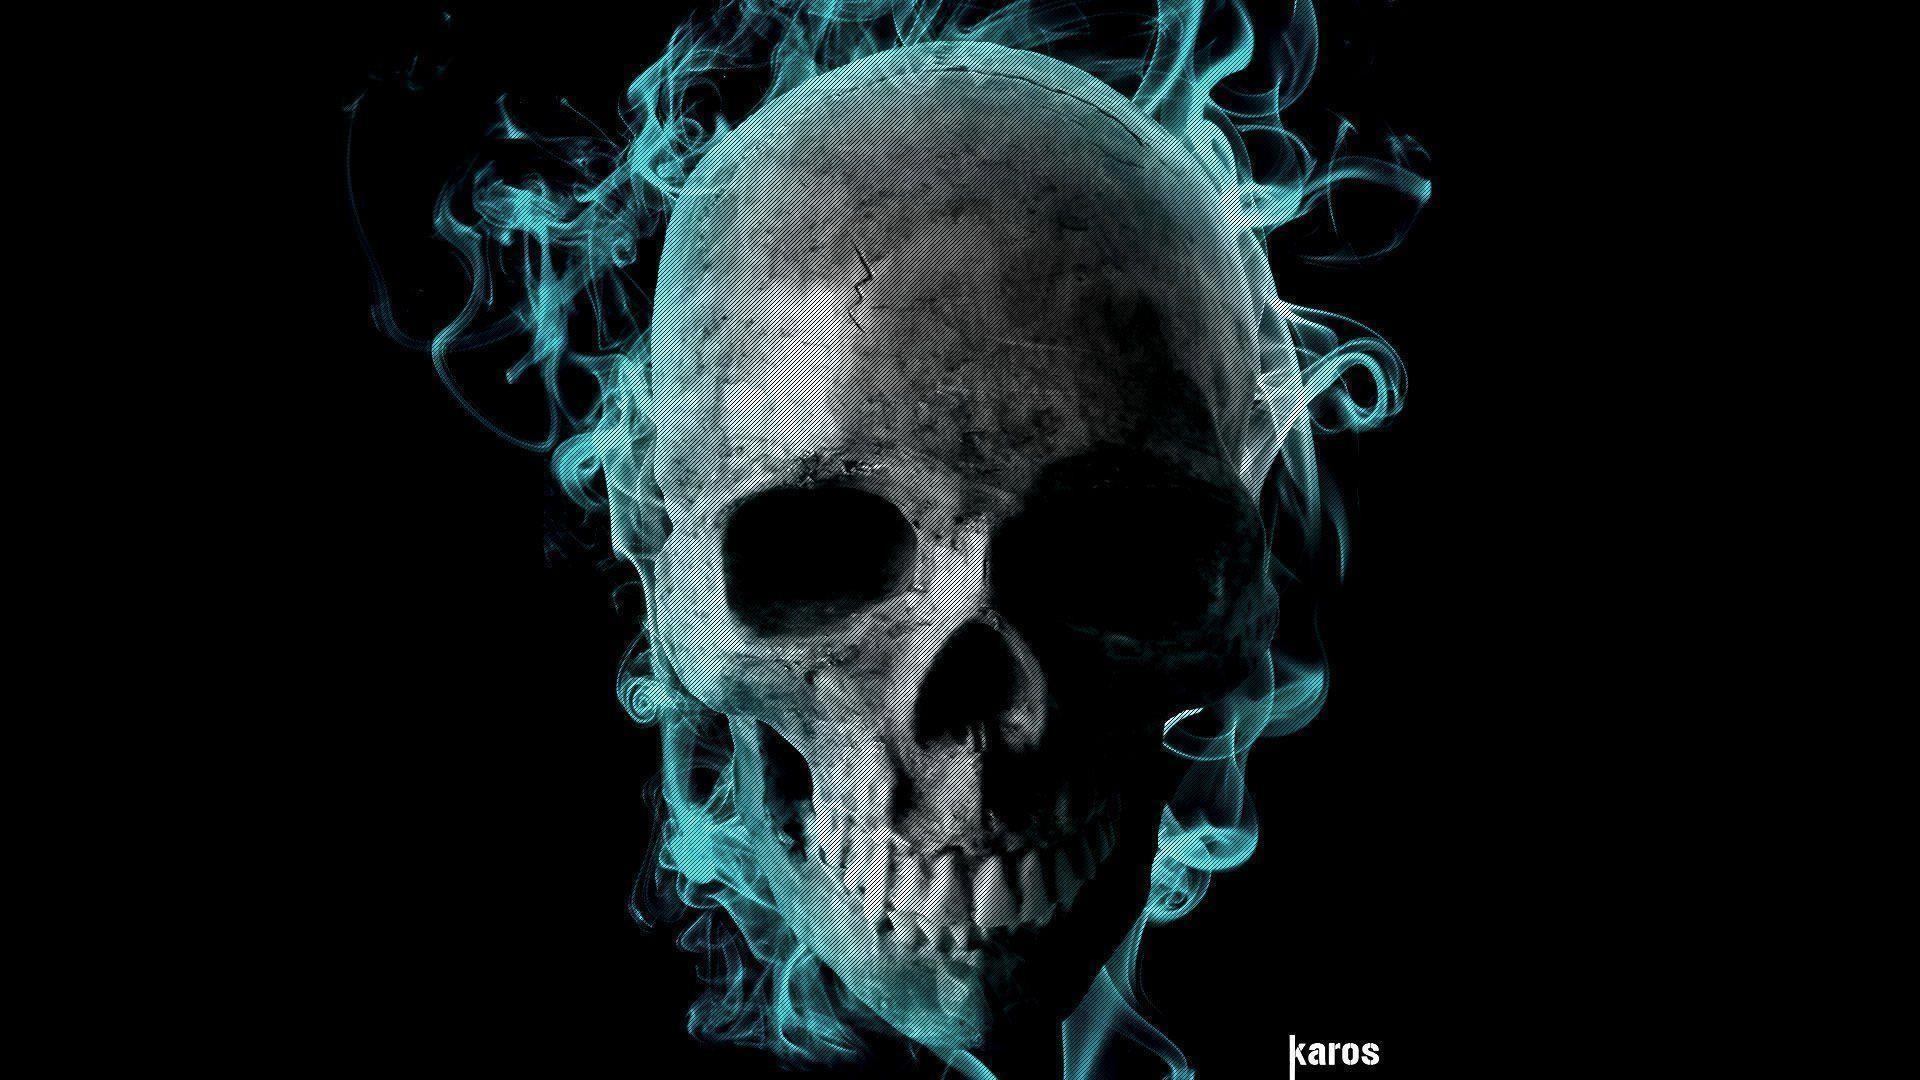 Taringa Data Src W Full A 3 E 204757 Ultra Hd 4k Skull 1920x1080 Download Hd Wallpaper Wallpapertip